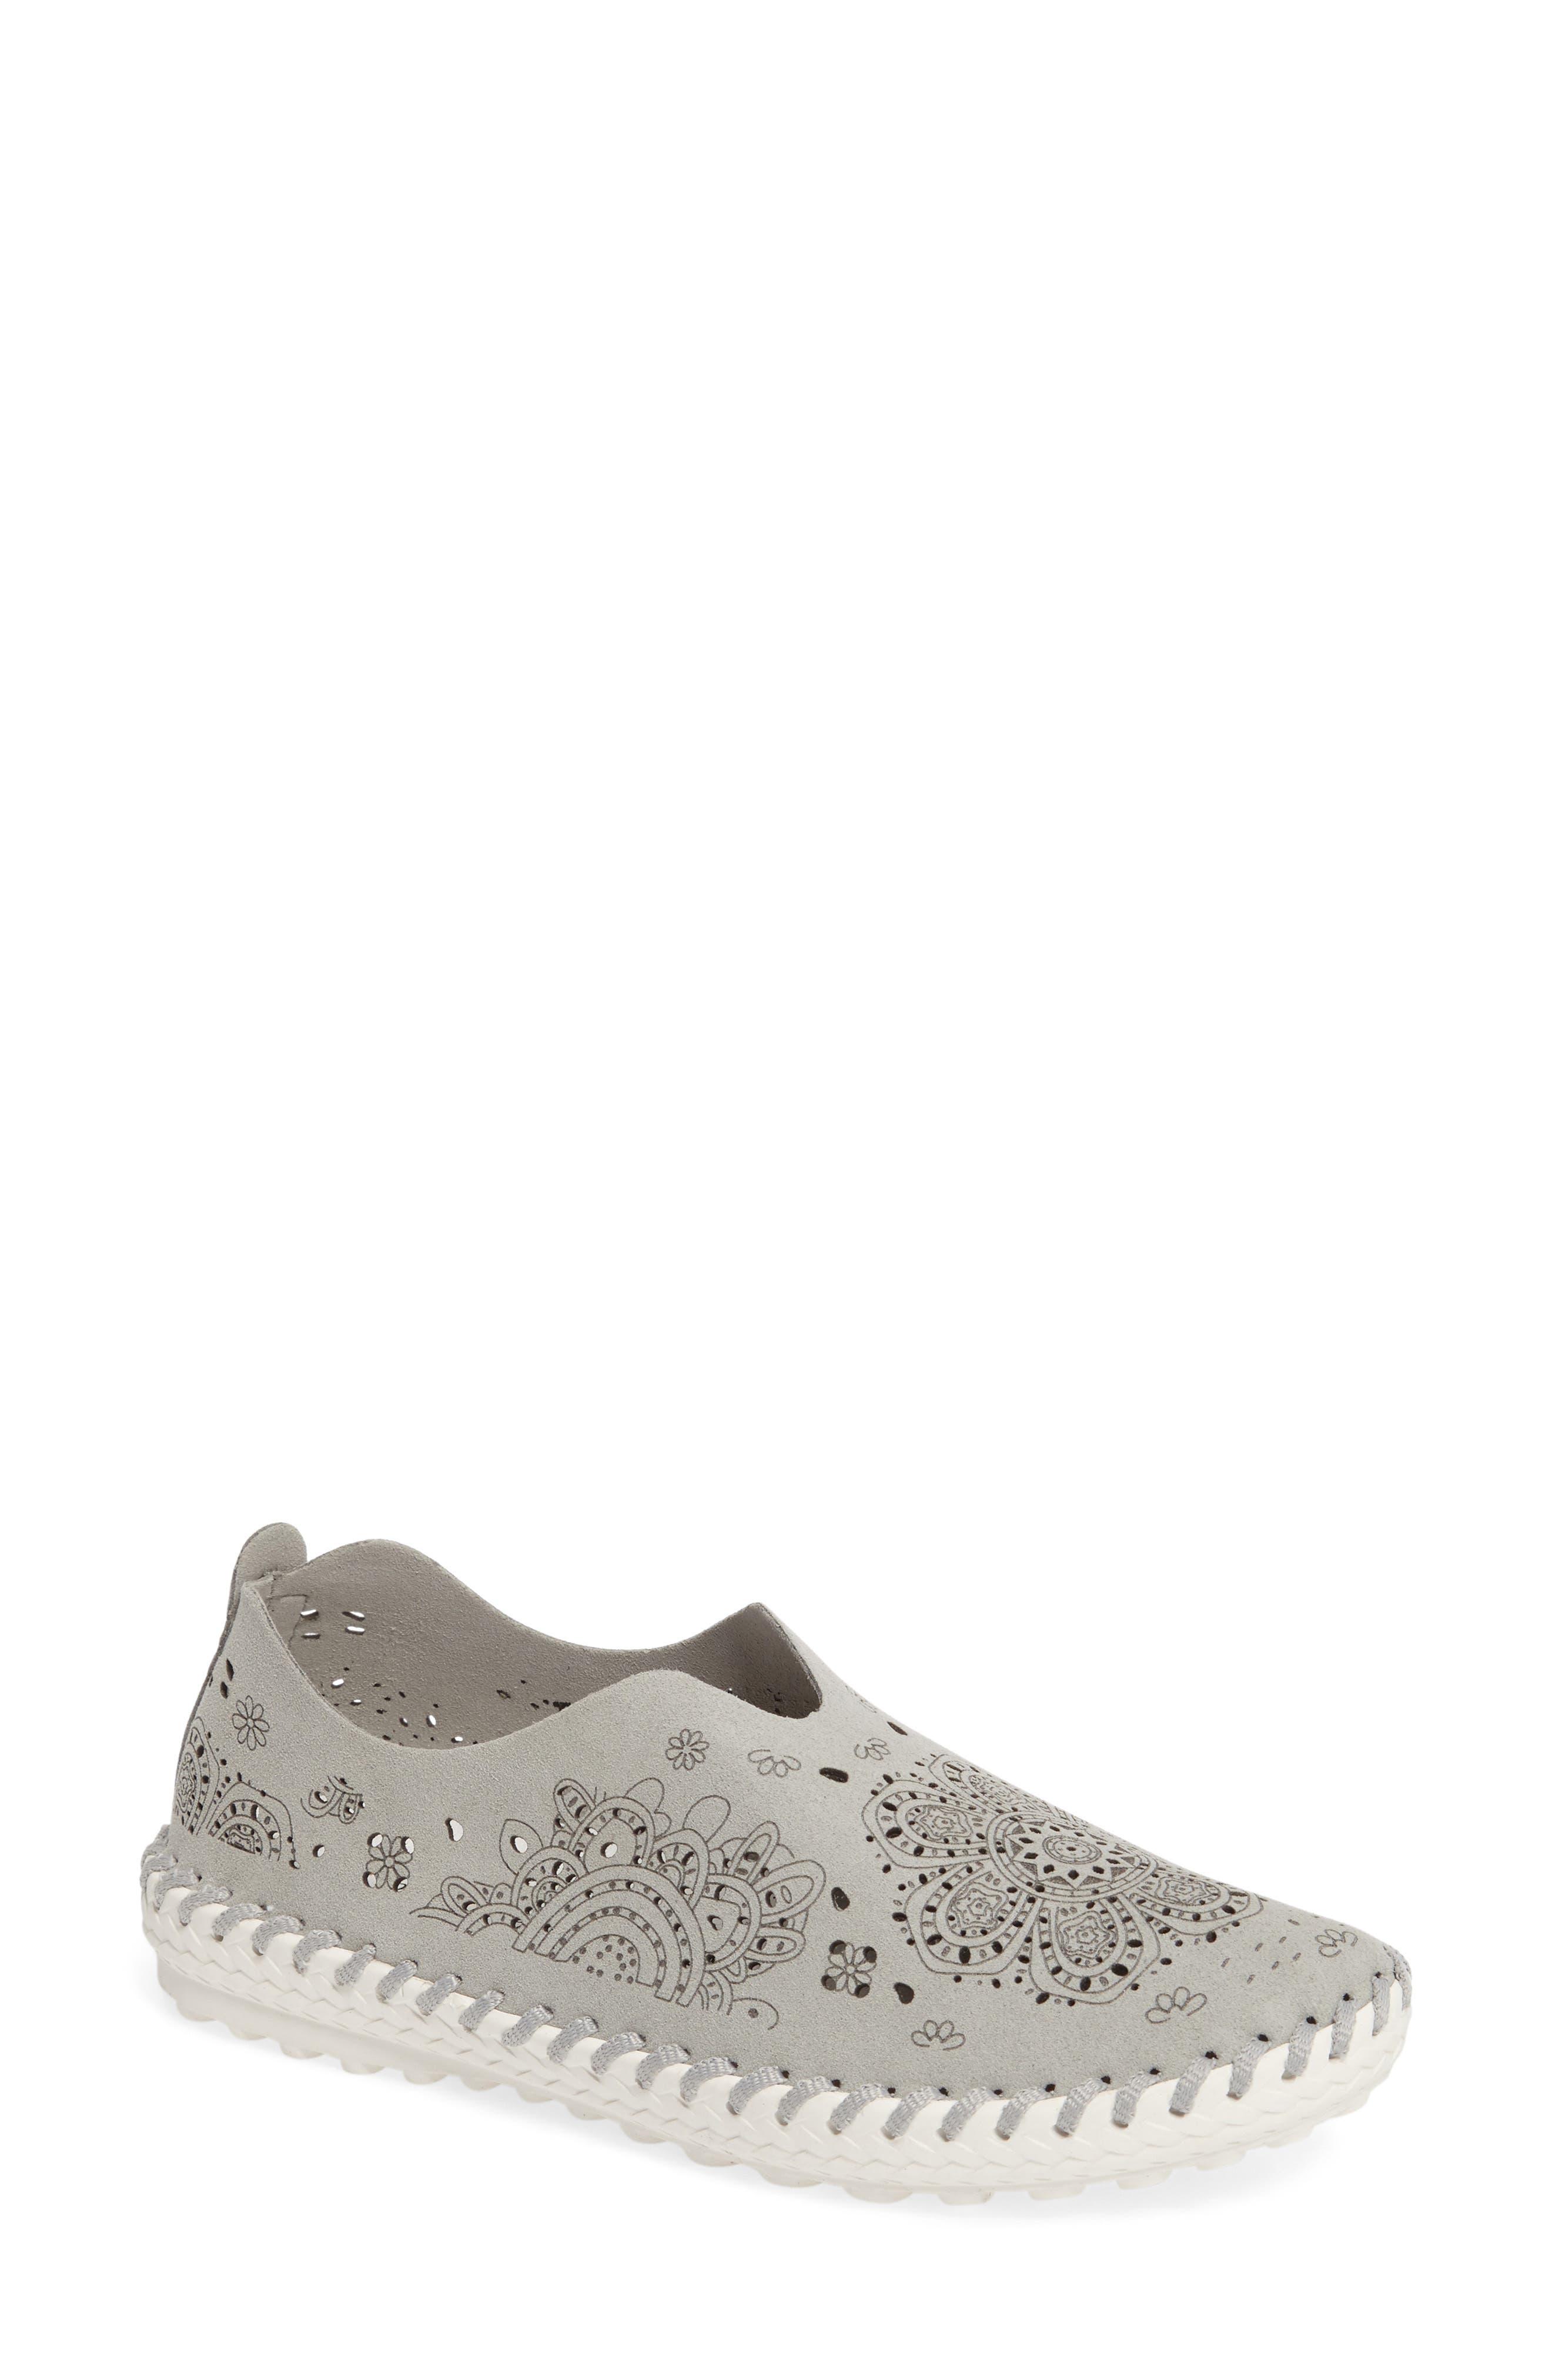 TW09 Slip-On Sneaker,                             Main thumbnail 1, color,                             Light Grey Leather